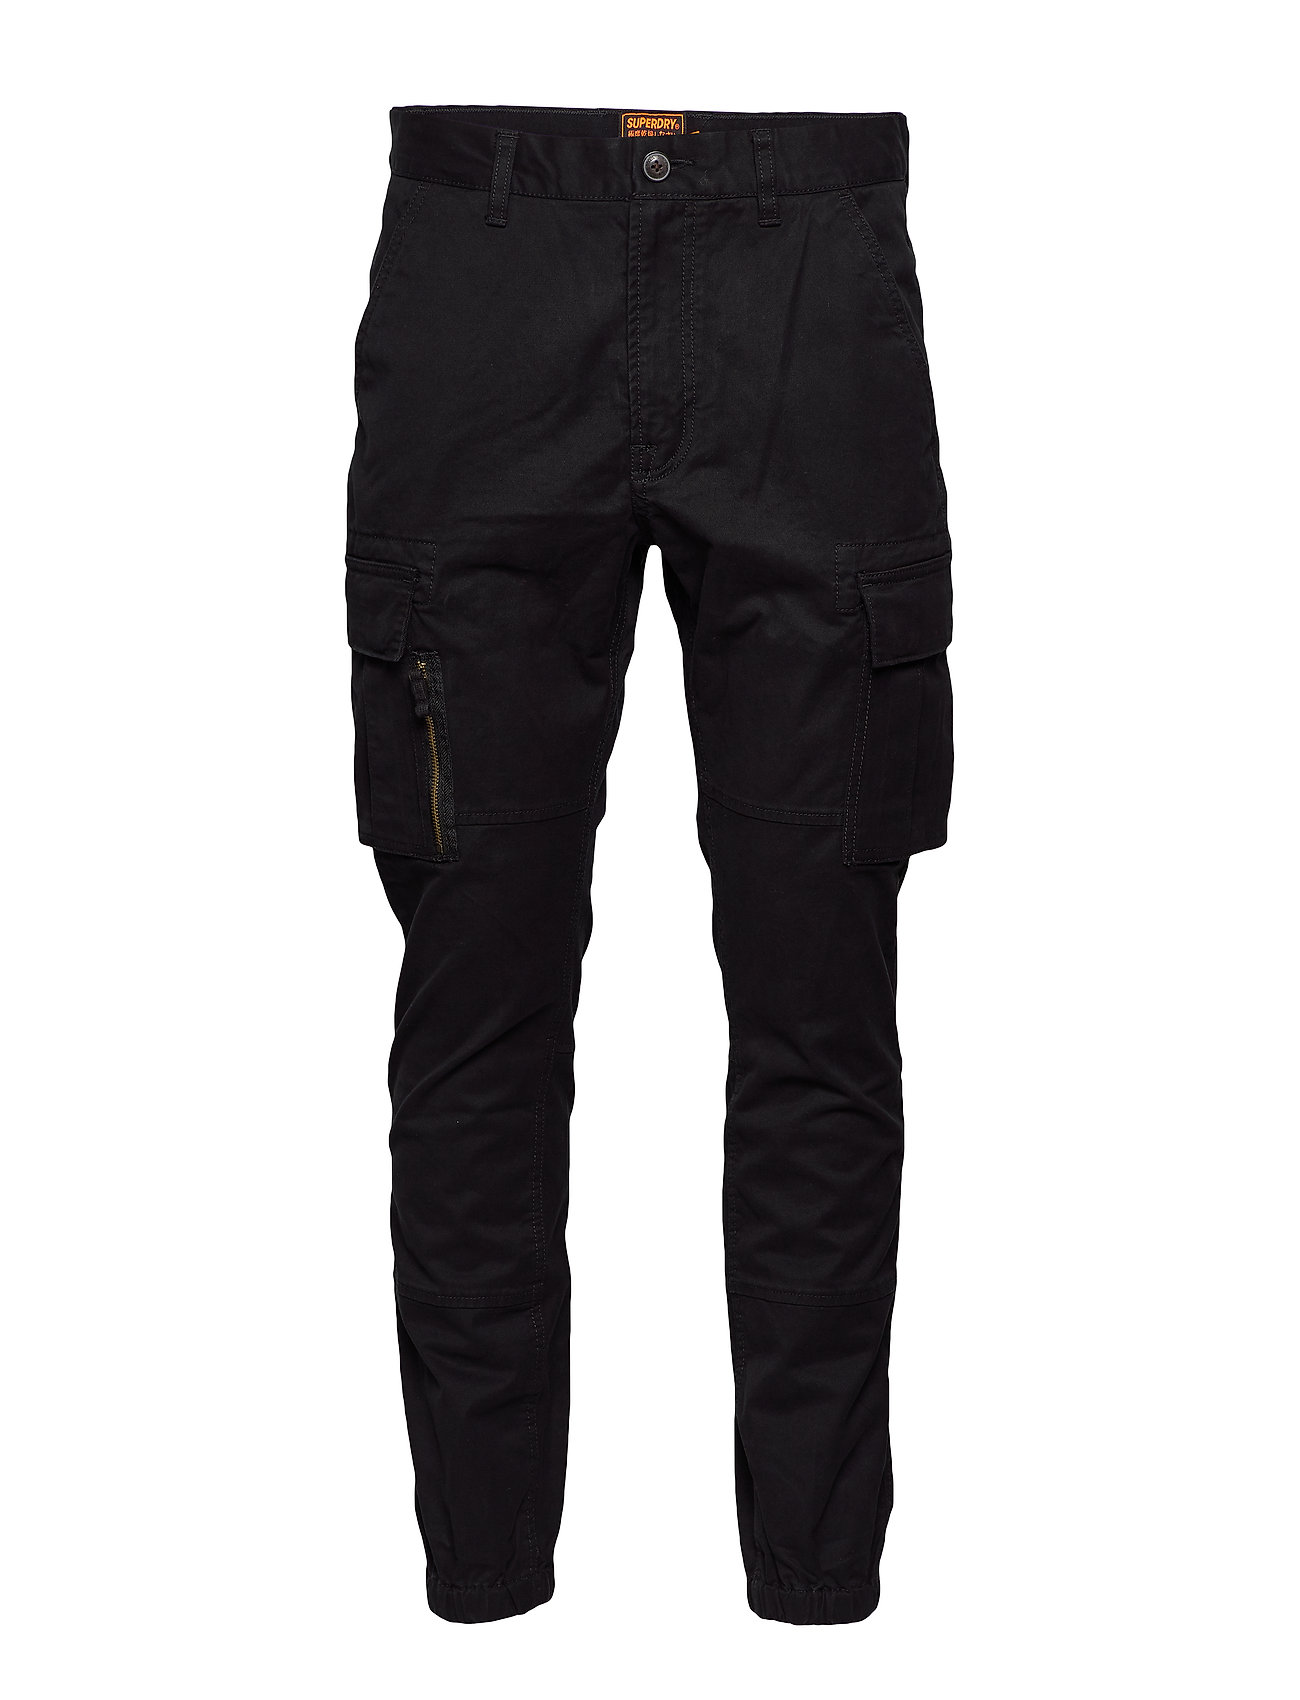 Image of Recruit Flight Grip Cargo Trousers Cargo Pants Sort Superdry (3350776885)